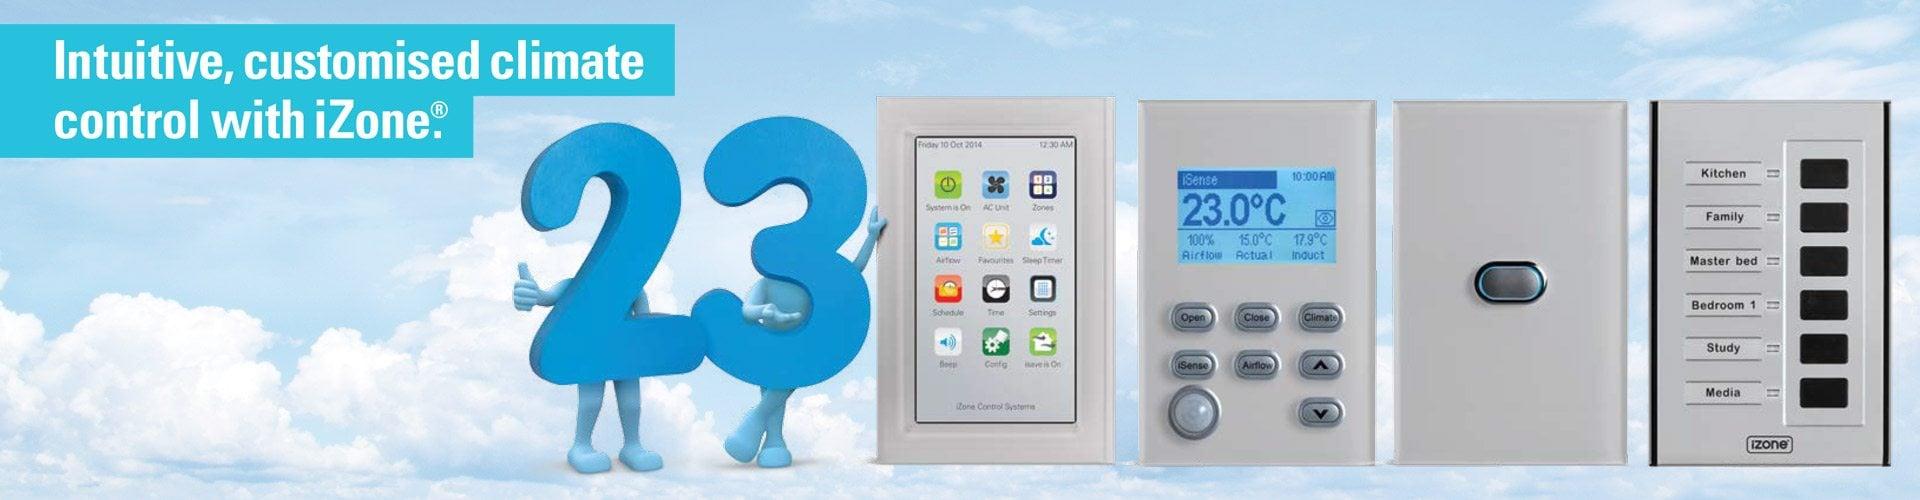 izone customised climate control air conditioning